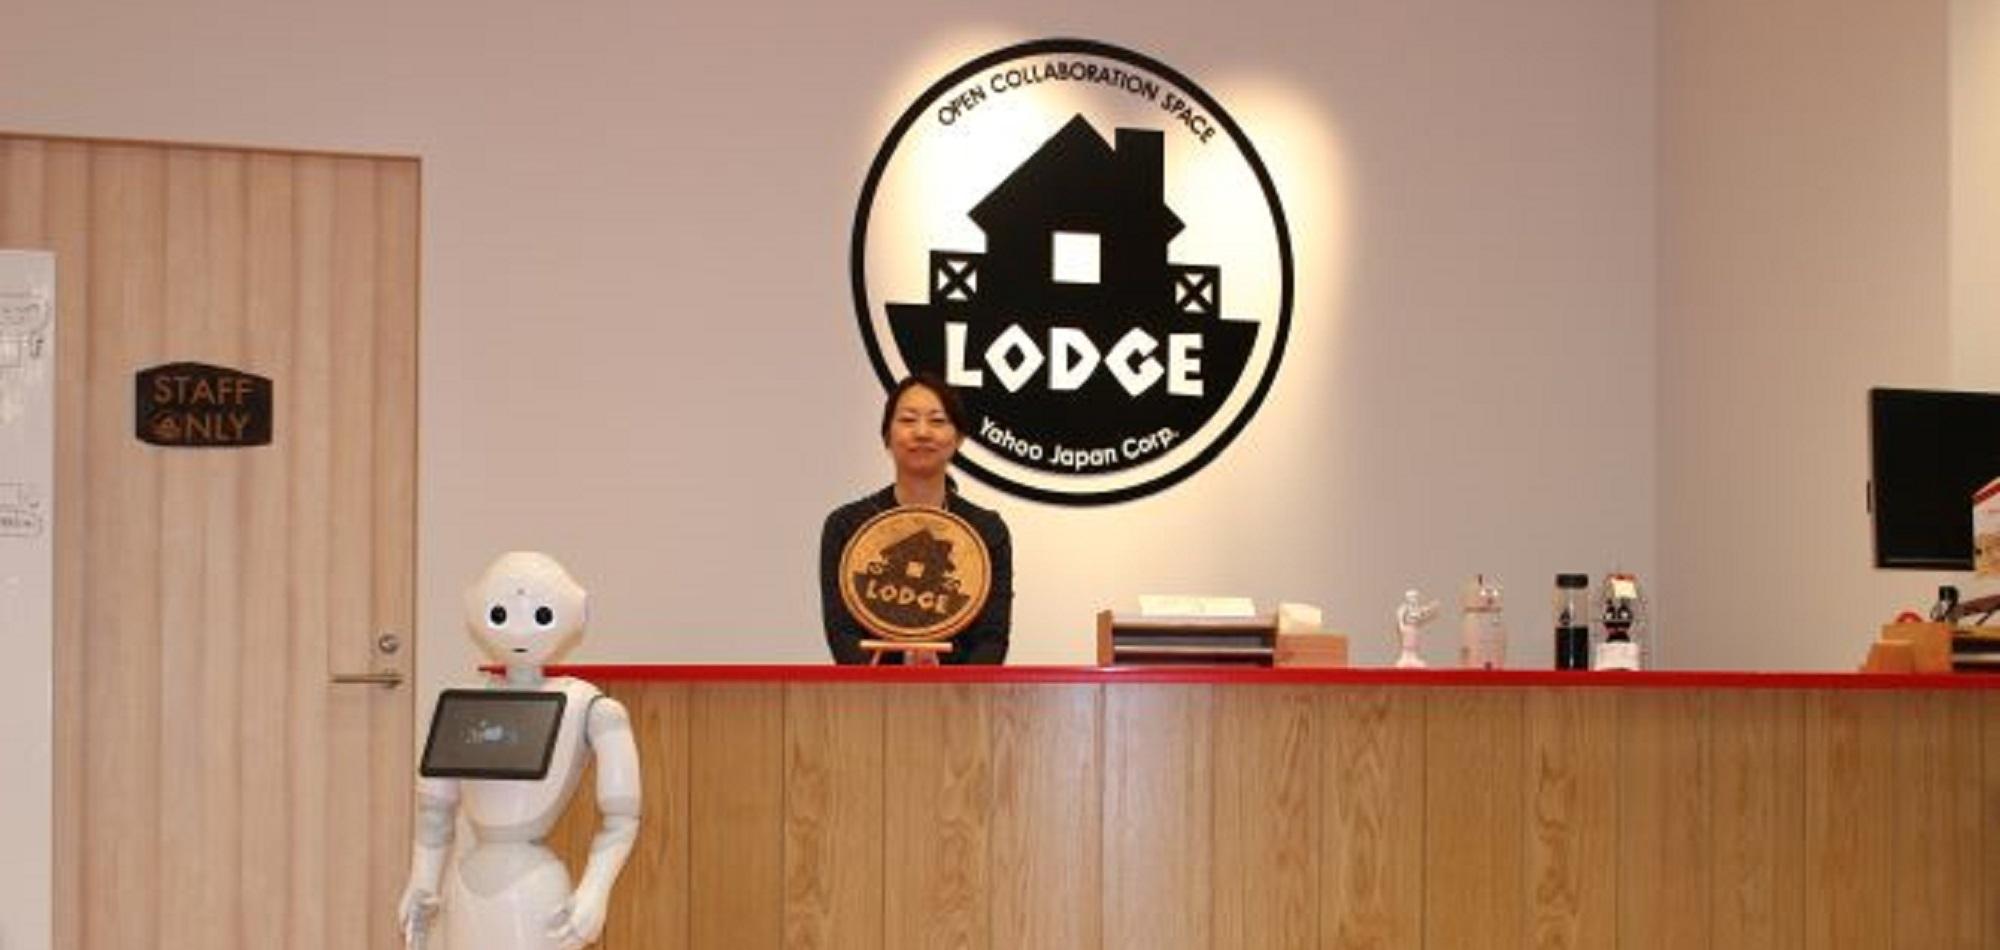 LODGEの写真